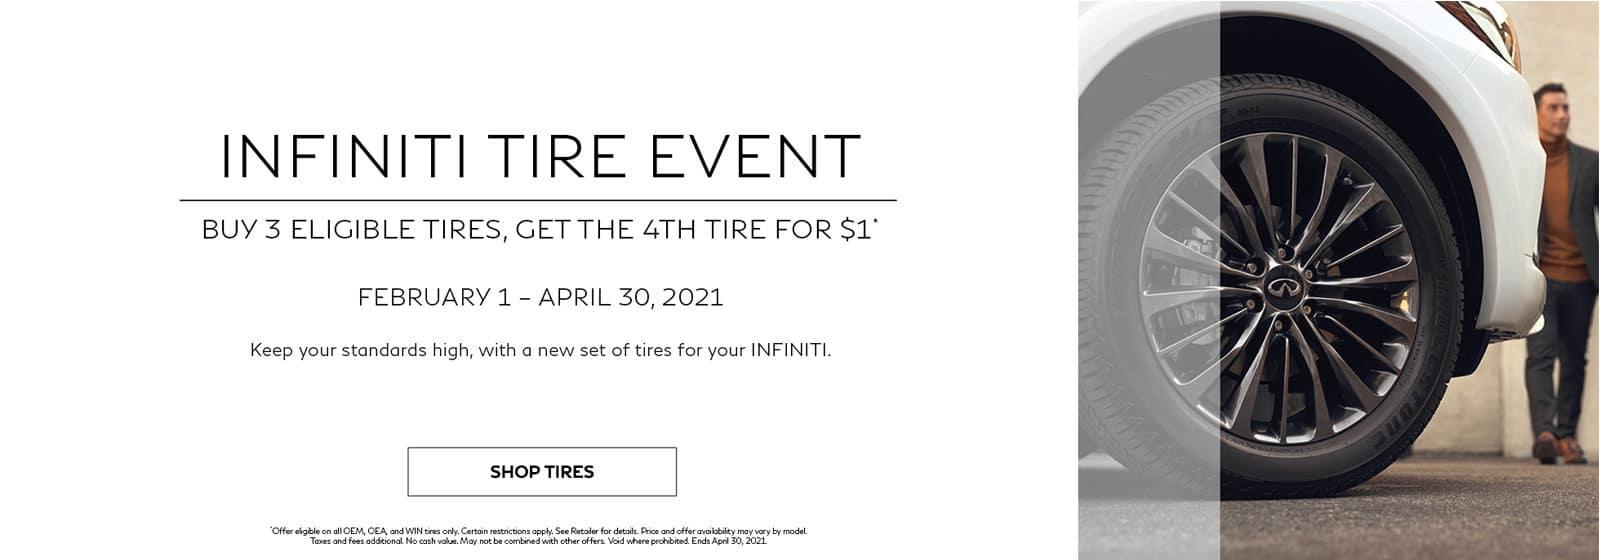 Tires_FEB2021